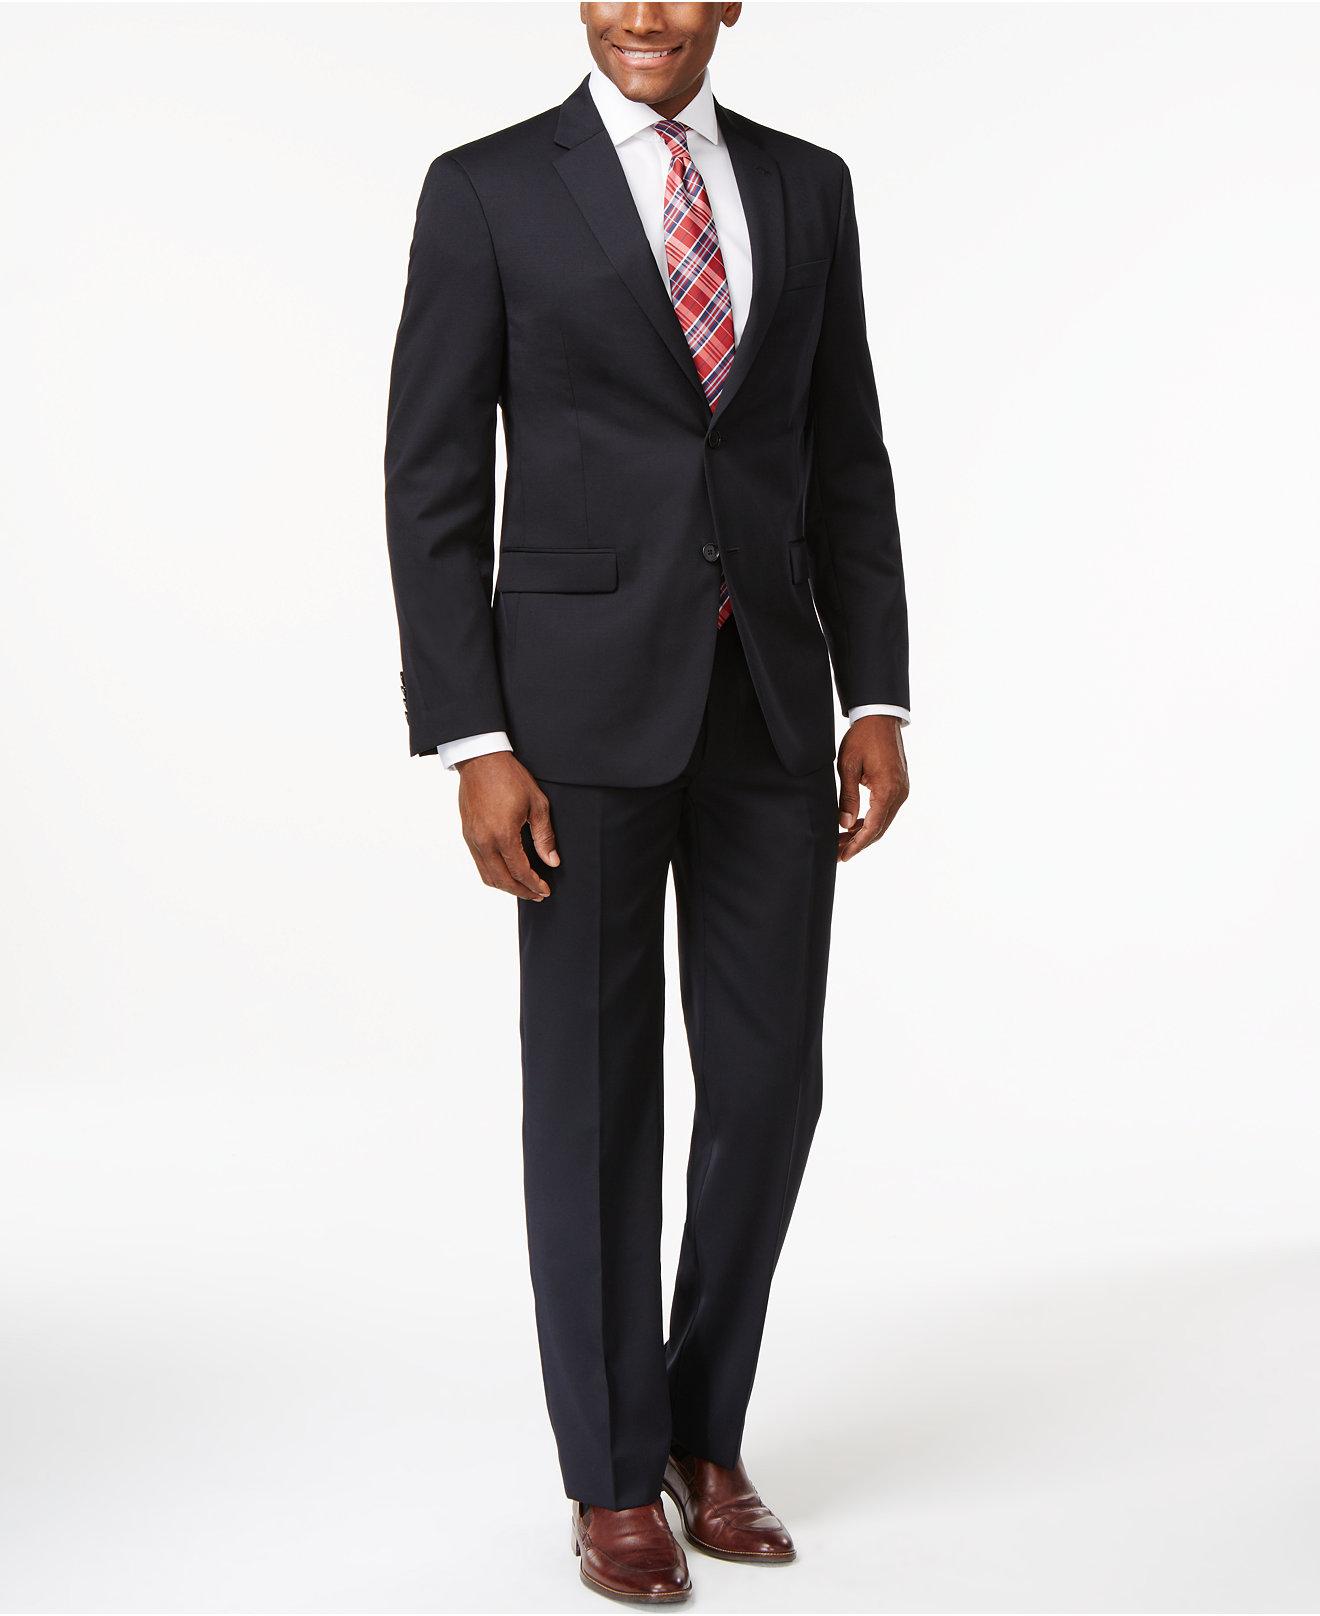 Mens Suits at Macy's - Mens Apparel - Macy's